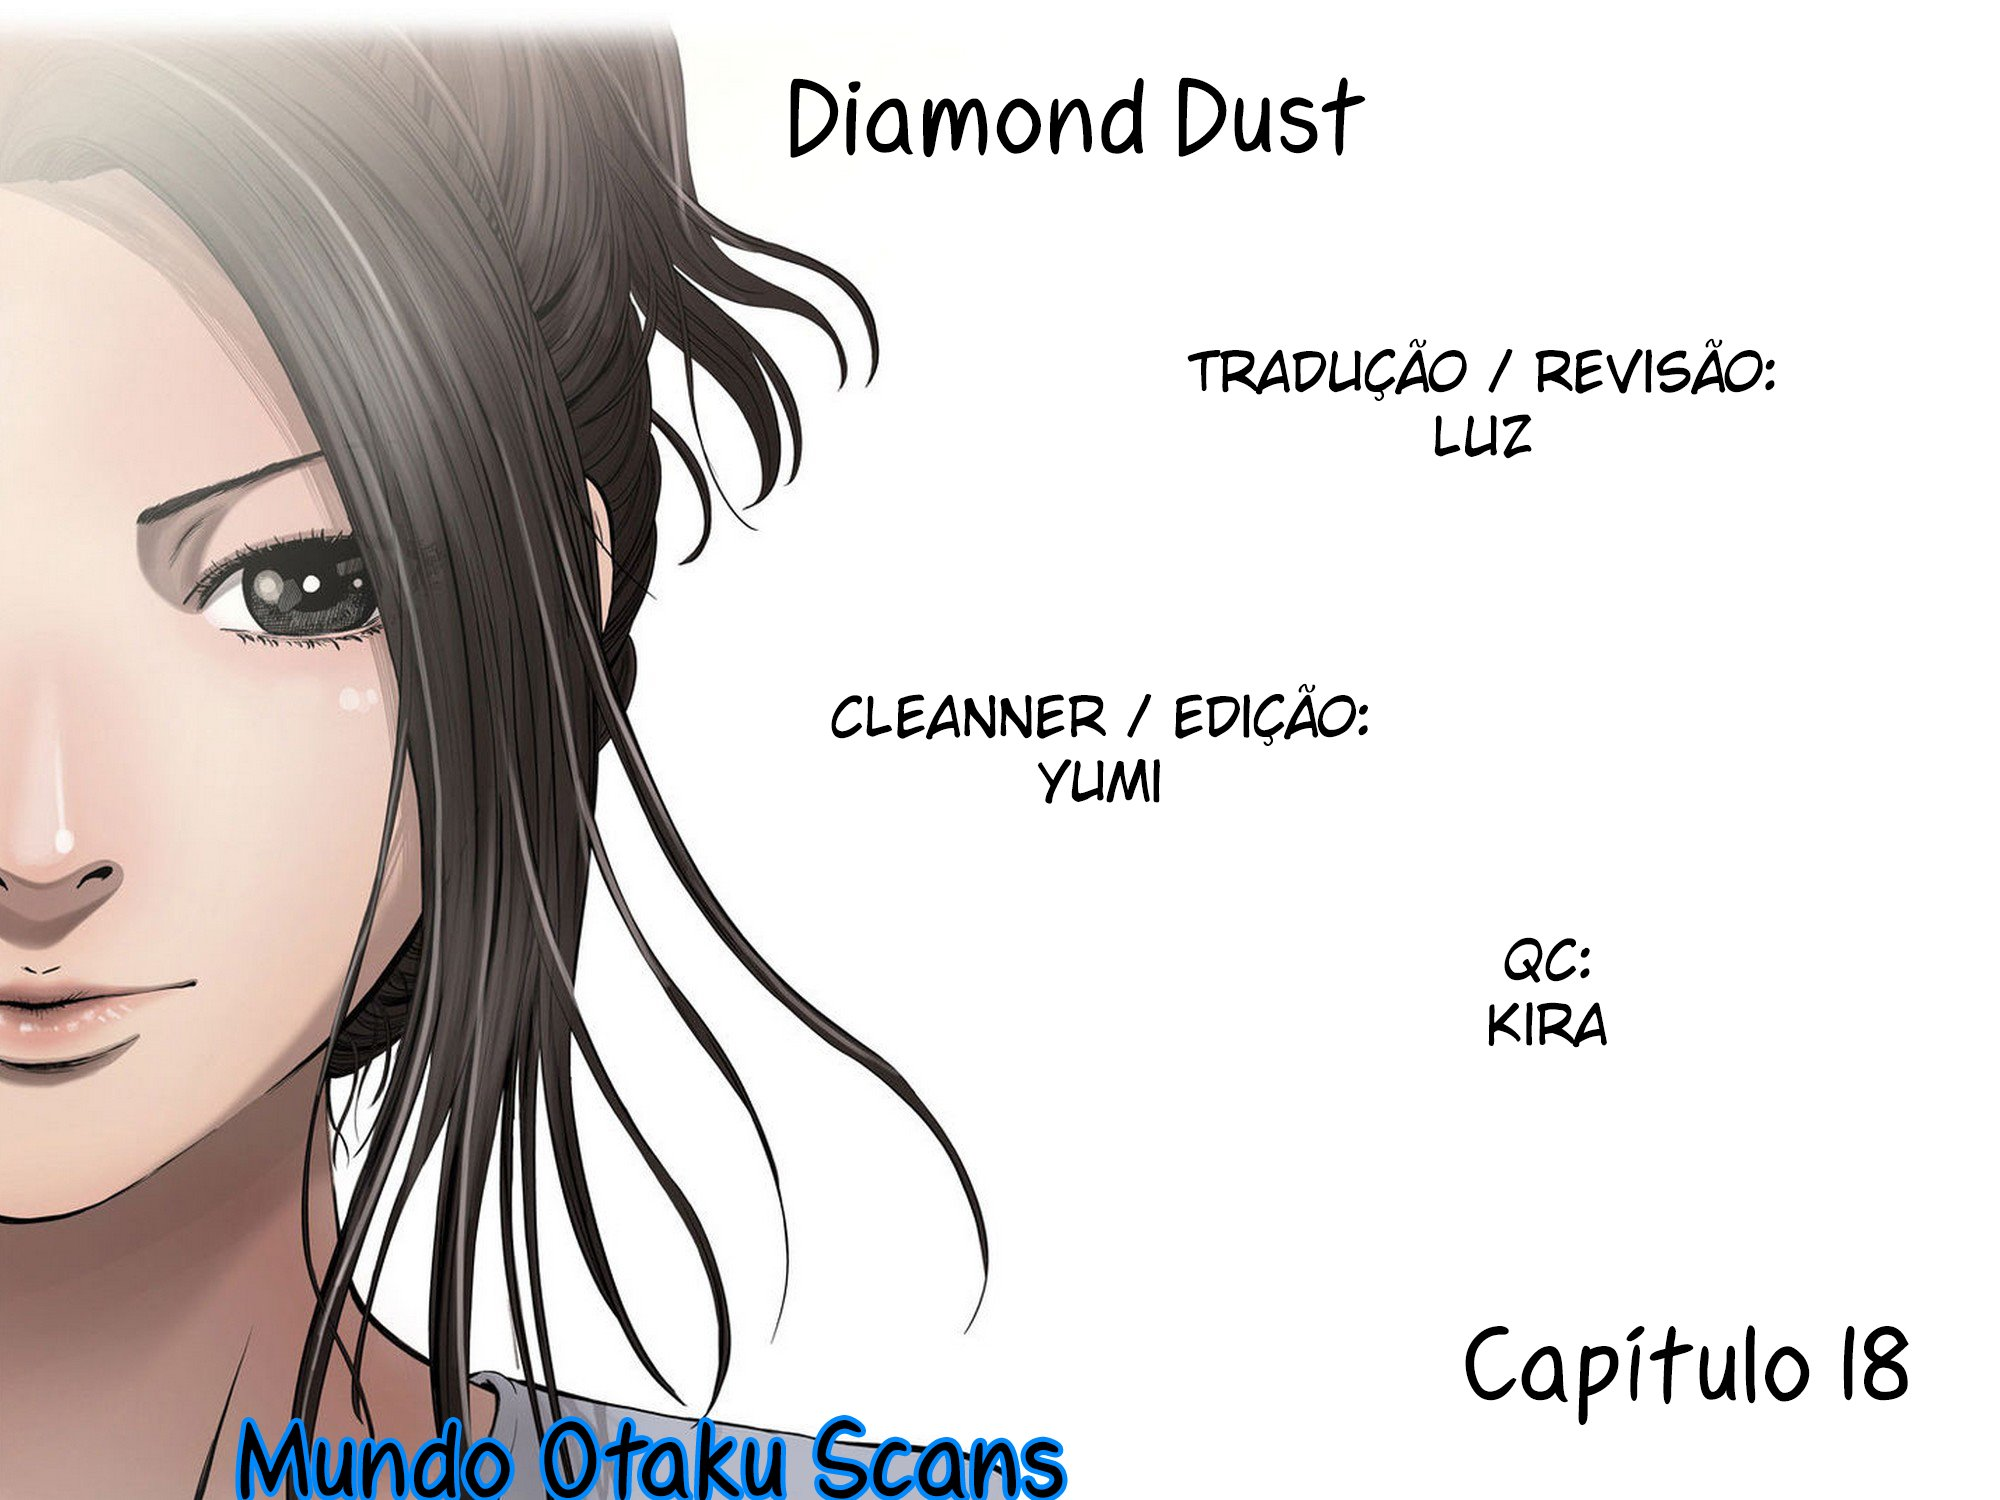 https://nine.mangadogs.com/br_manga/pic/8/328/1317280/DiamondDust018841.jpg Page 1